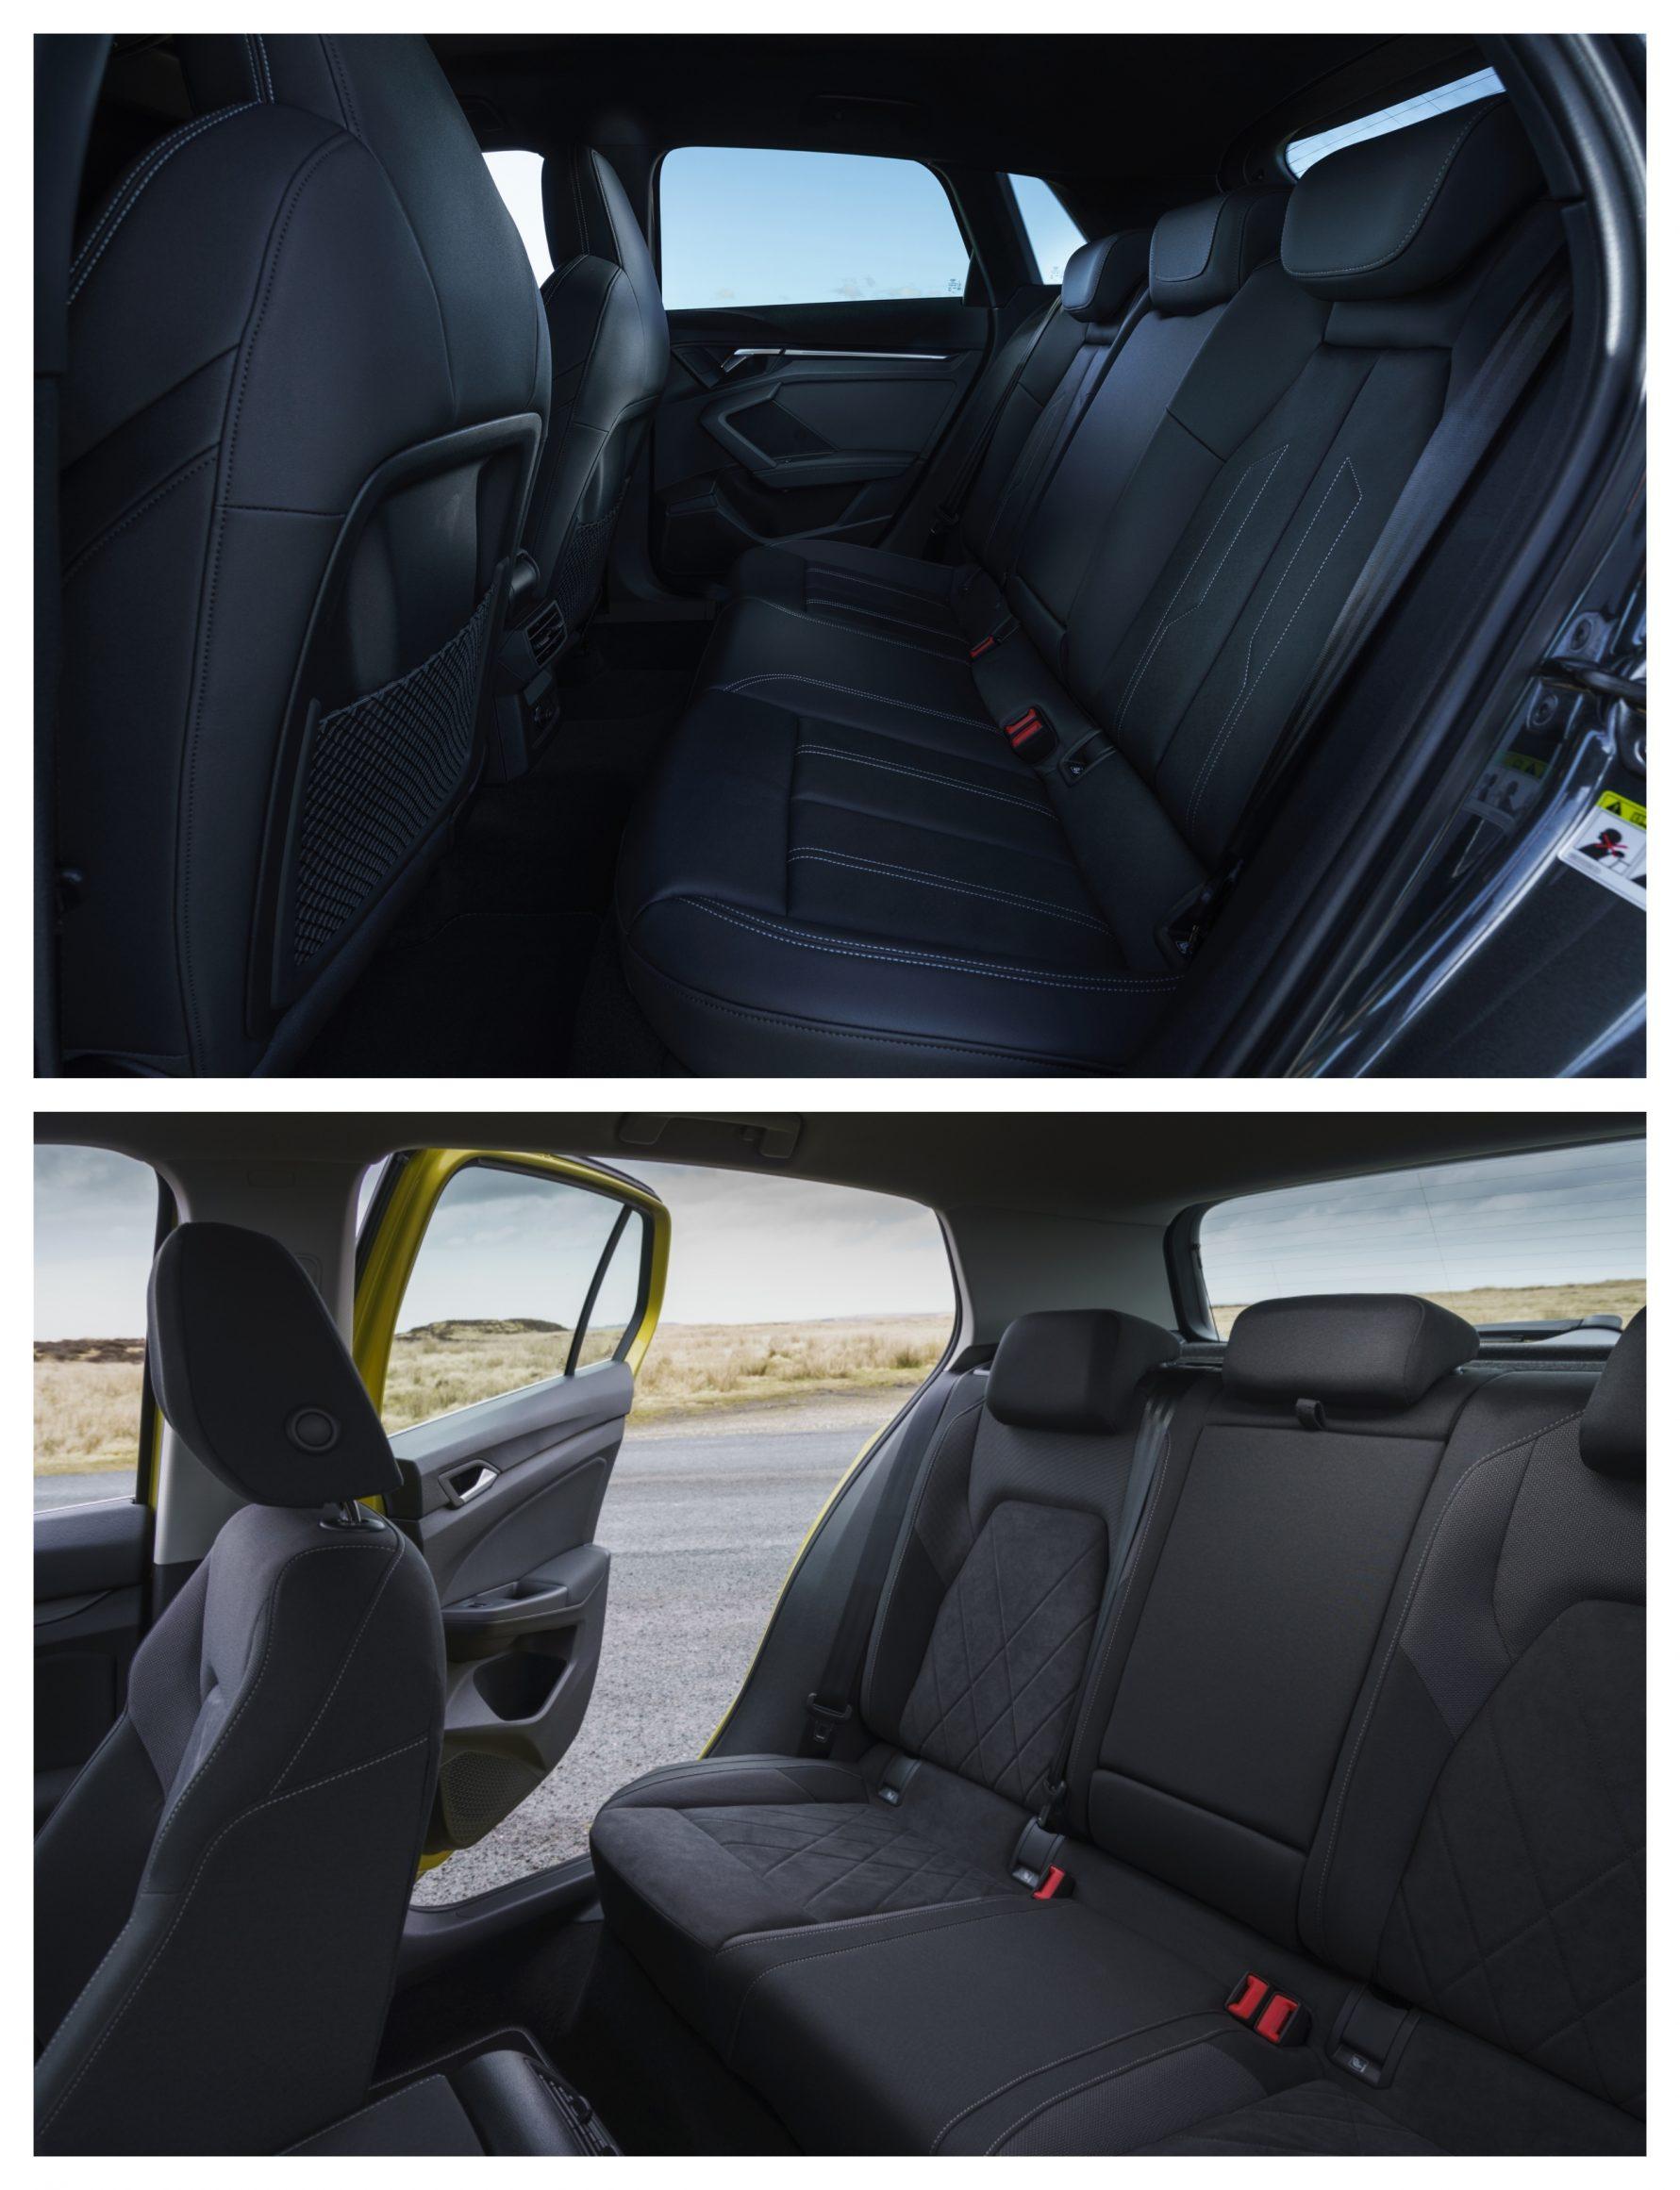 Audi A3 Vs Volkswagen Golf - interior design (space)